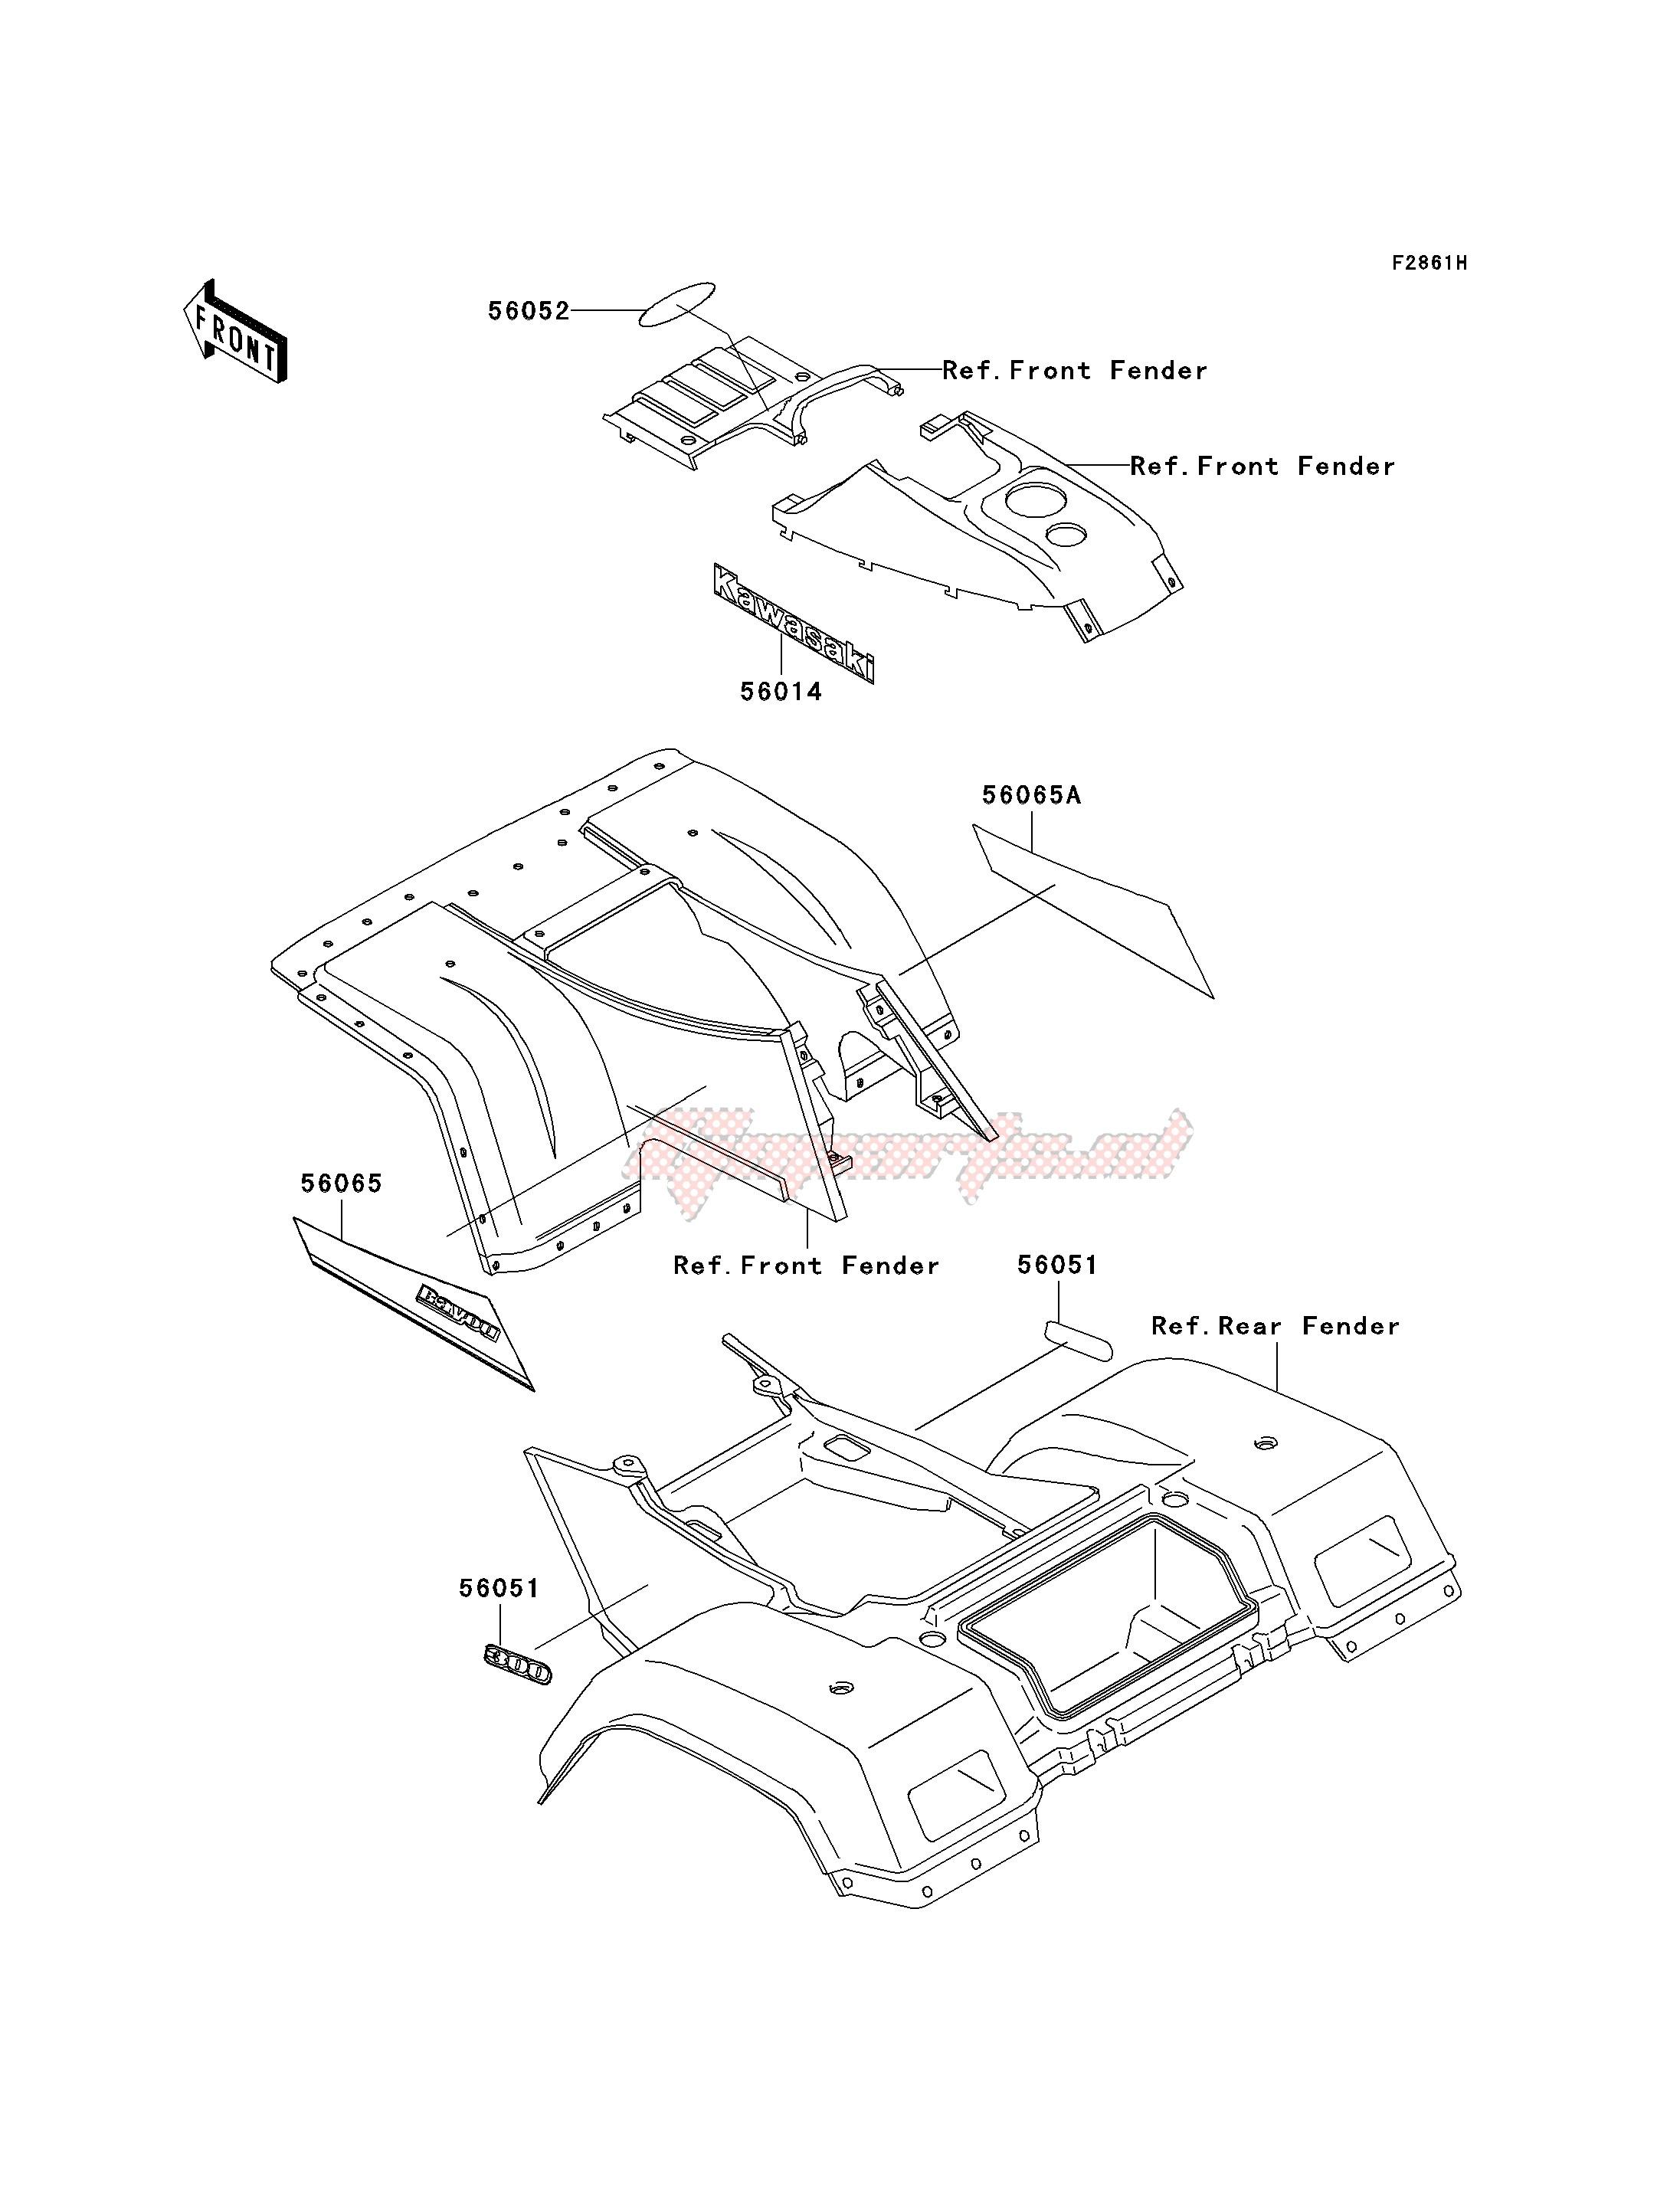 Oem Parts Kawasaki All Terrain Klf 300 C Bayou 300 4x4